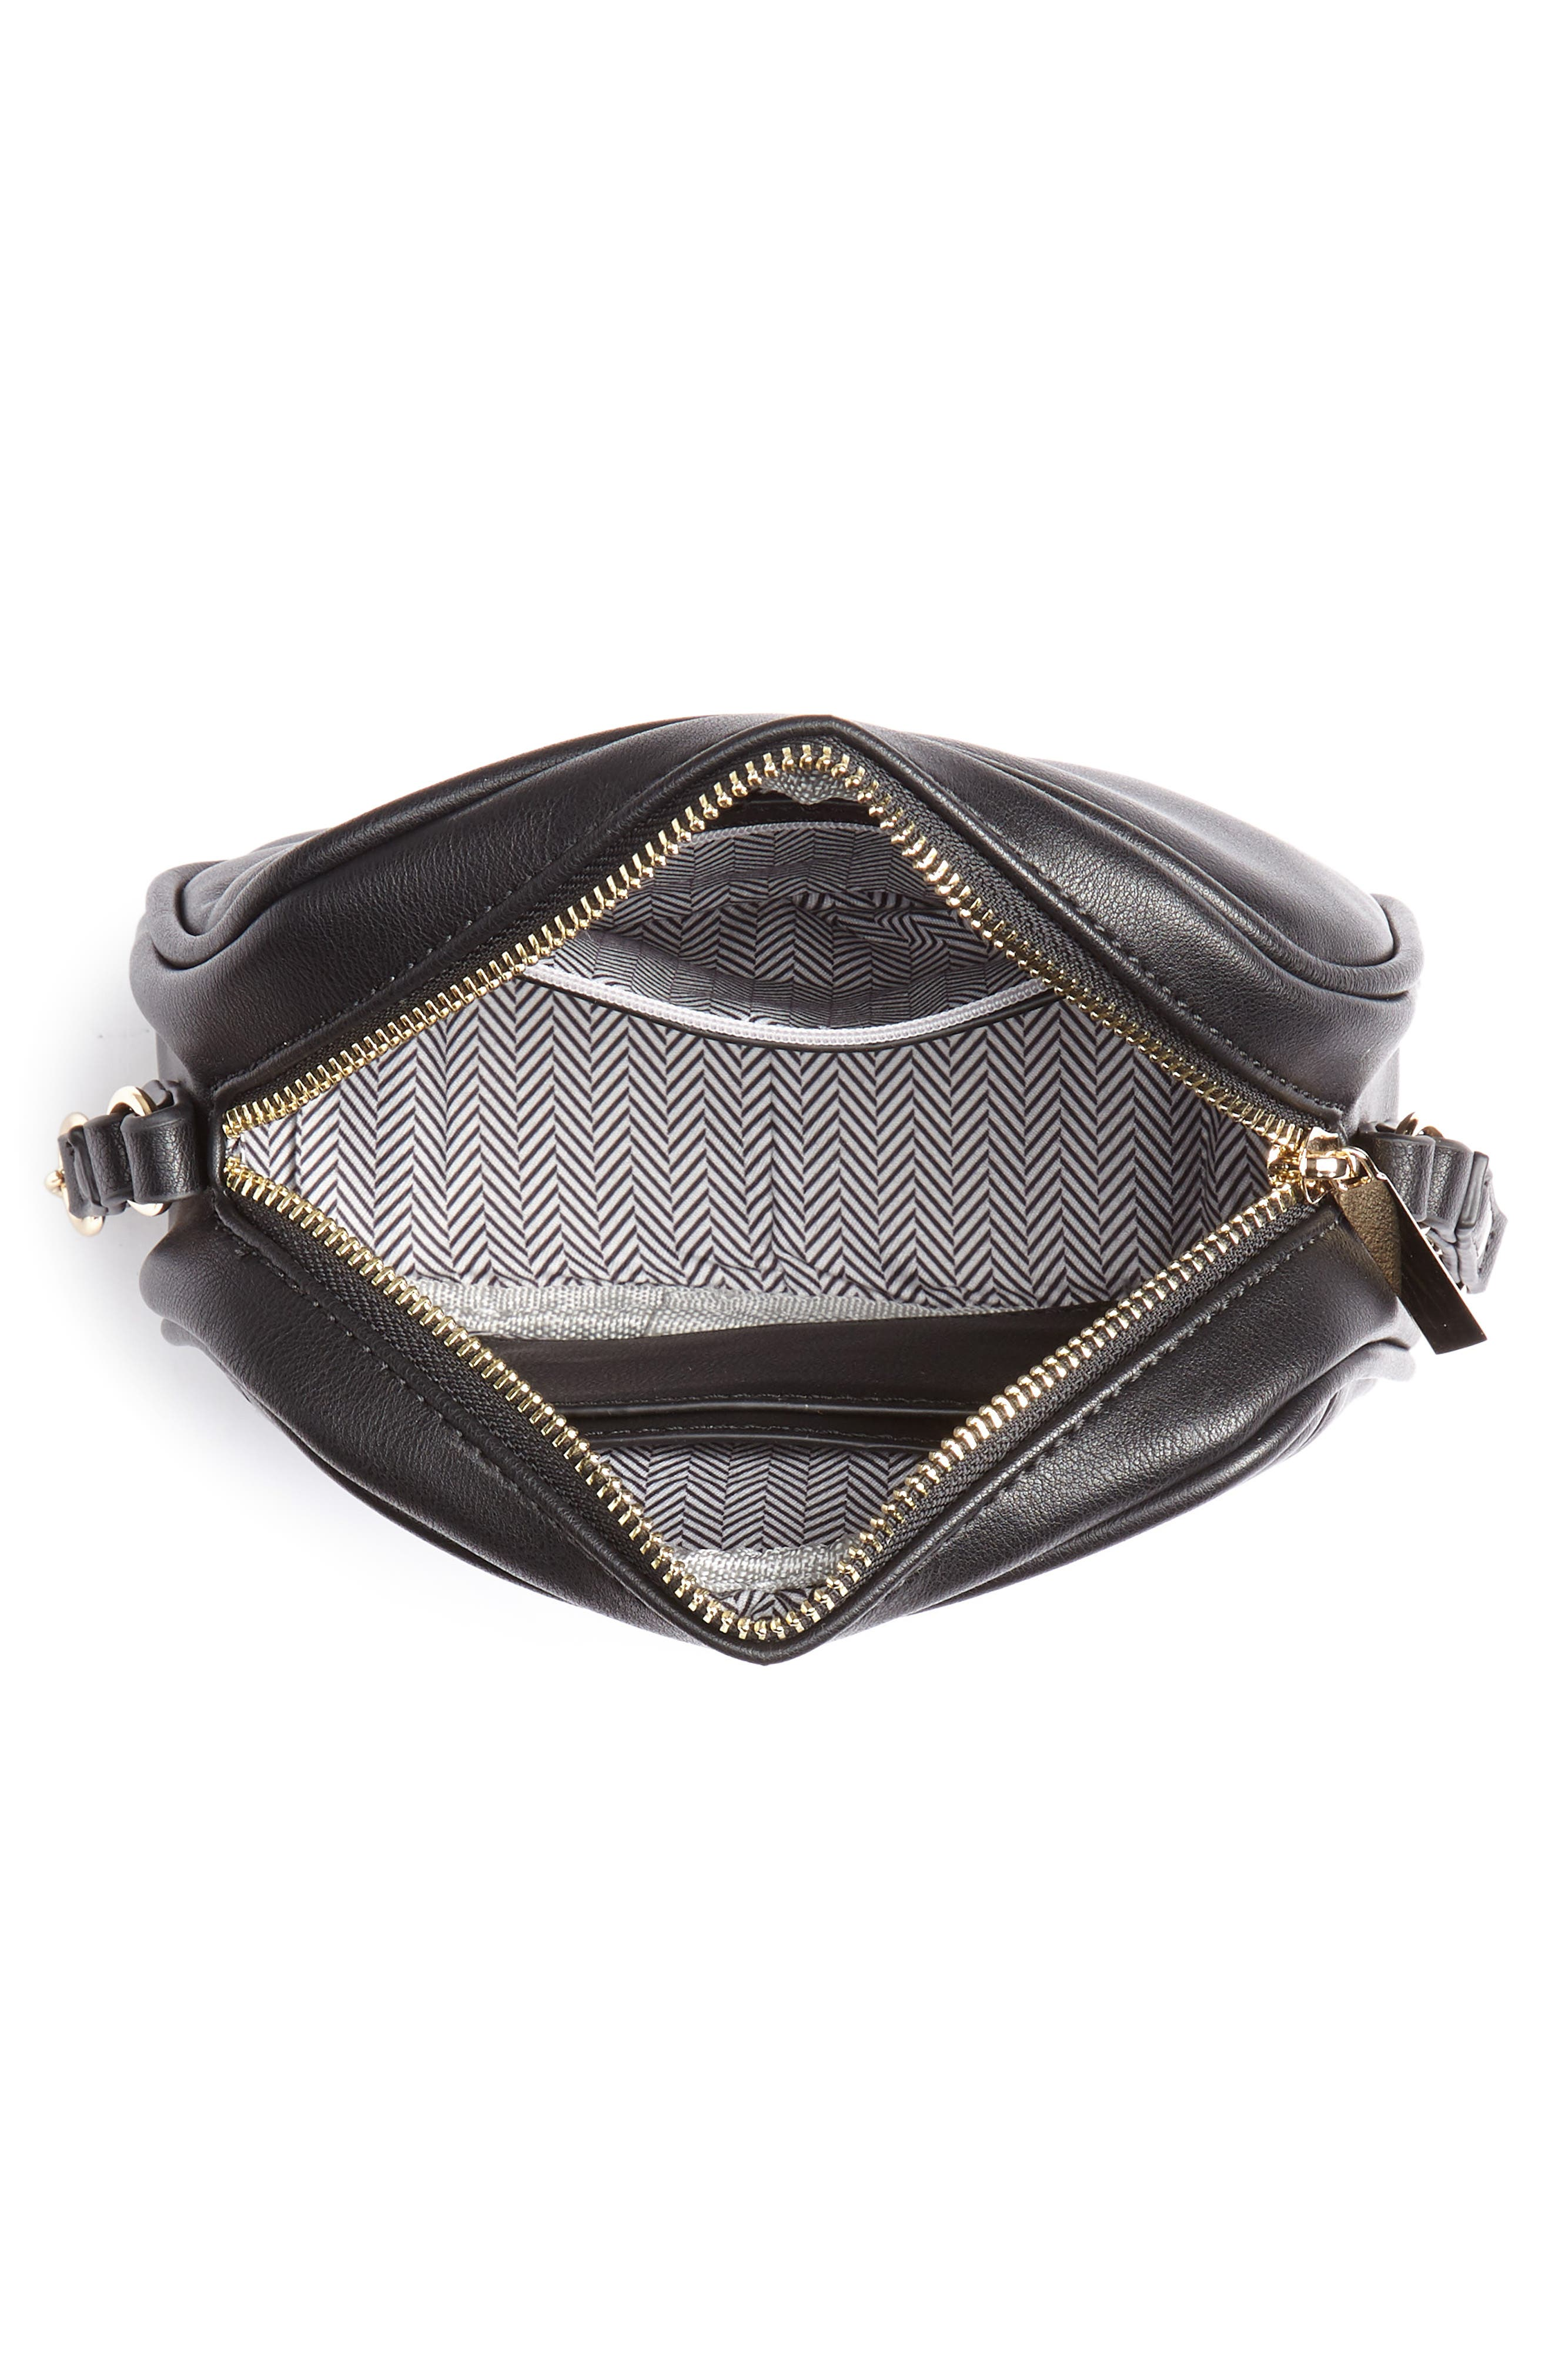 MALI + LILI, Cassidy Vegan Leather Crossbody Camera Bag, Alternate thumbnail 5, color, 001